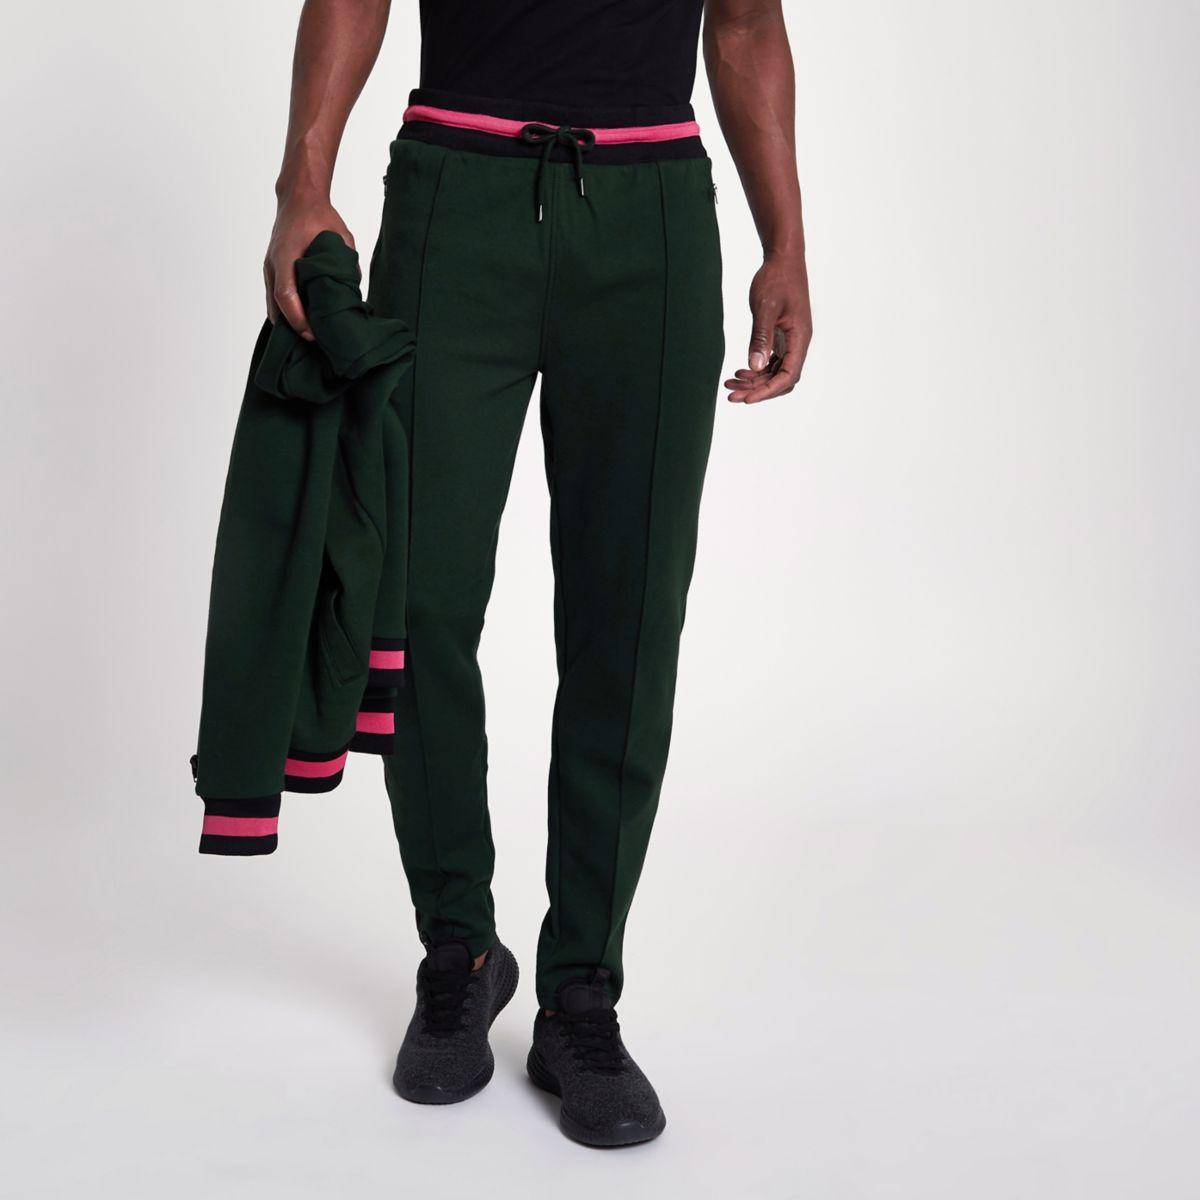 Green slim fit joggers